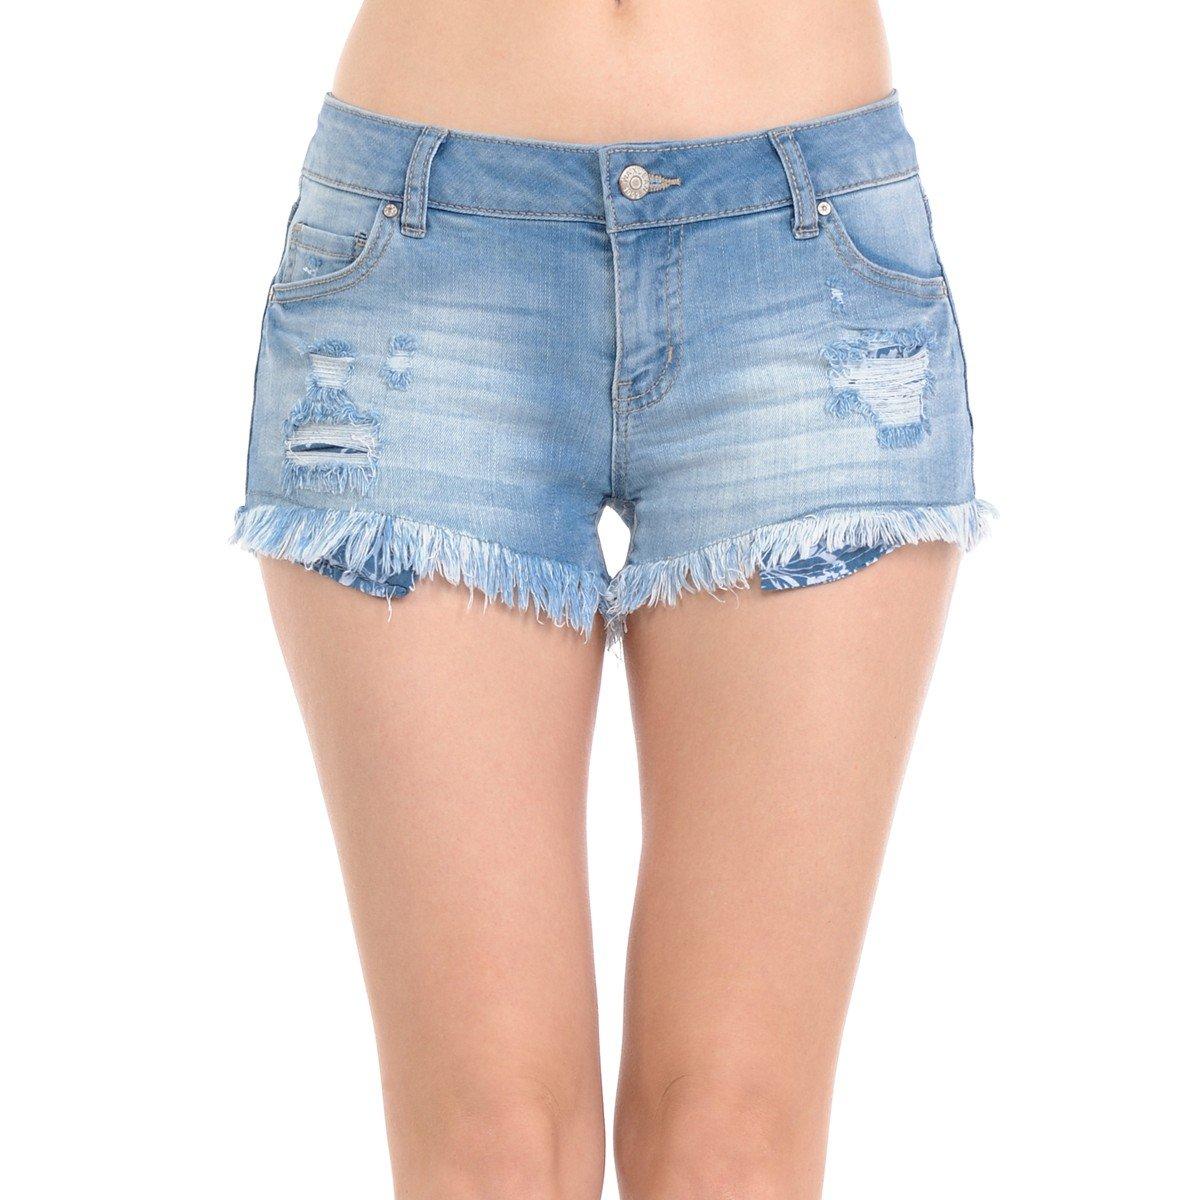 Wax Women's Juniors Denim Shorts w Heavy Frayed Hem (Small, Light Wash)